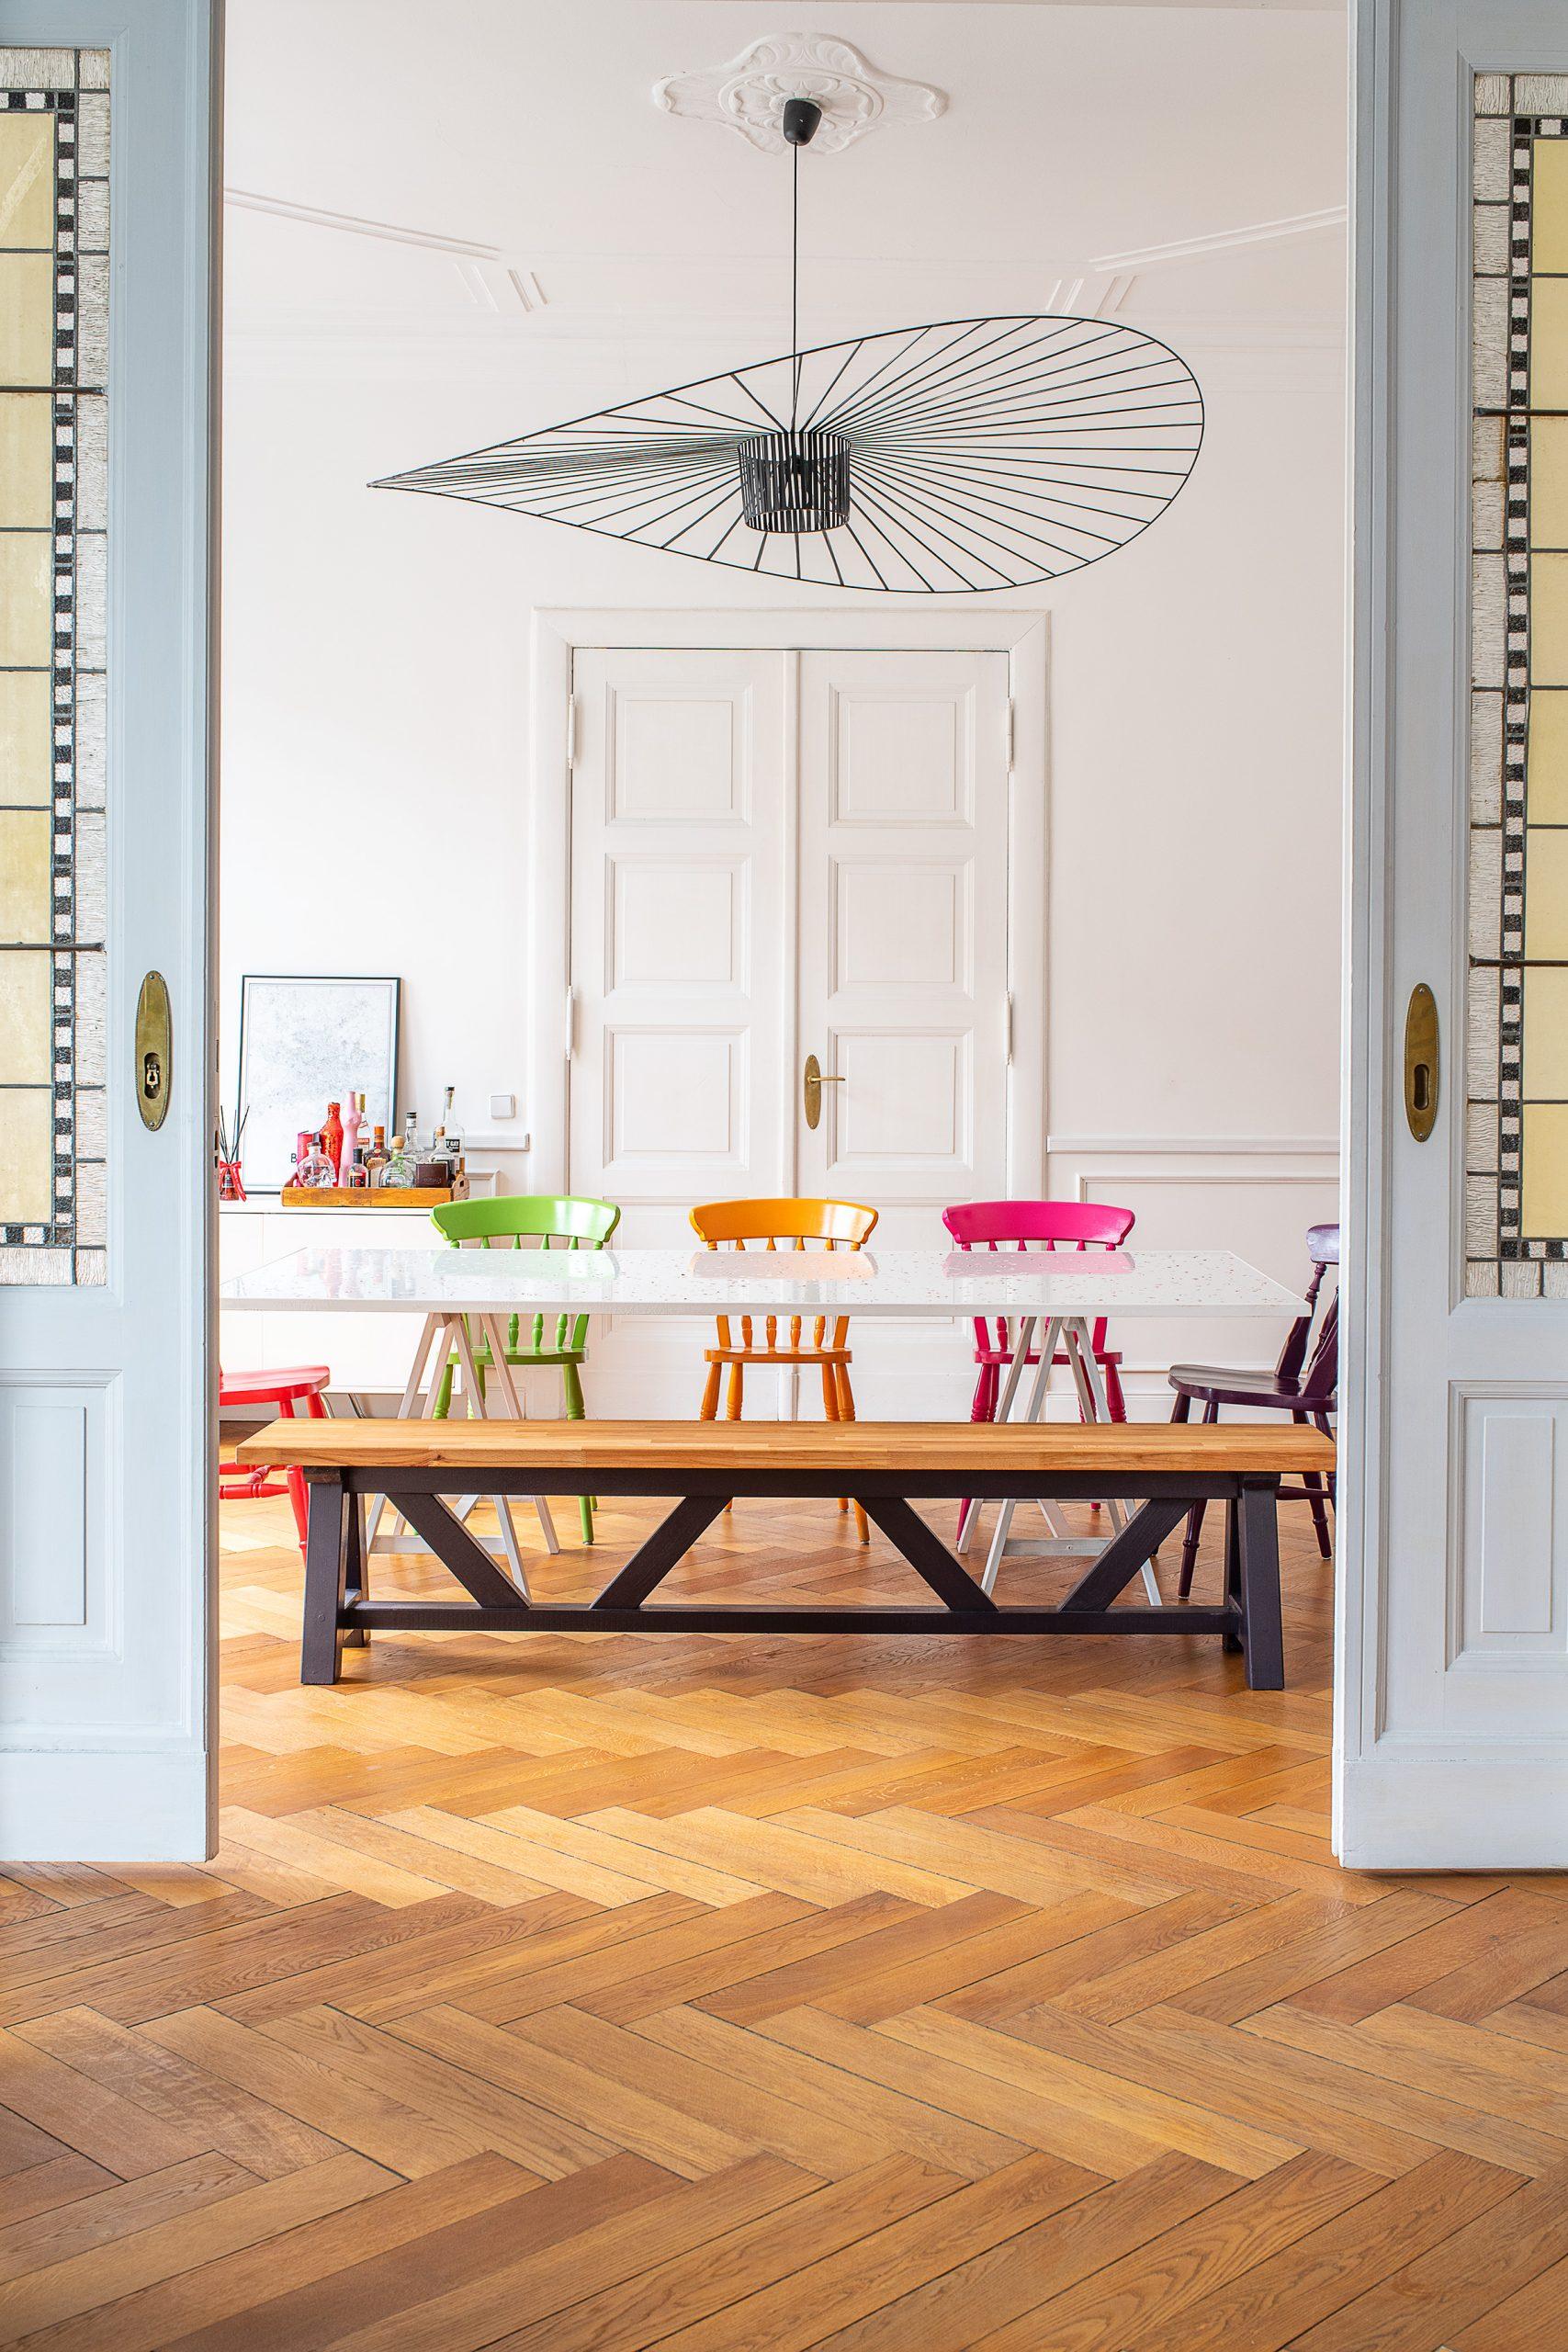 Diy Terrazzo Resin Table Easy Super Affordable Diy